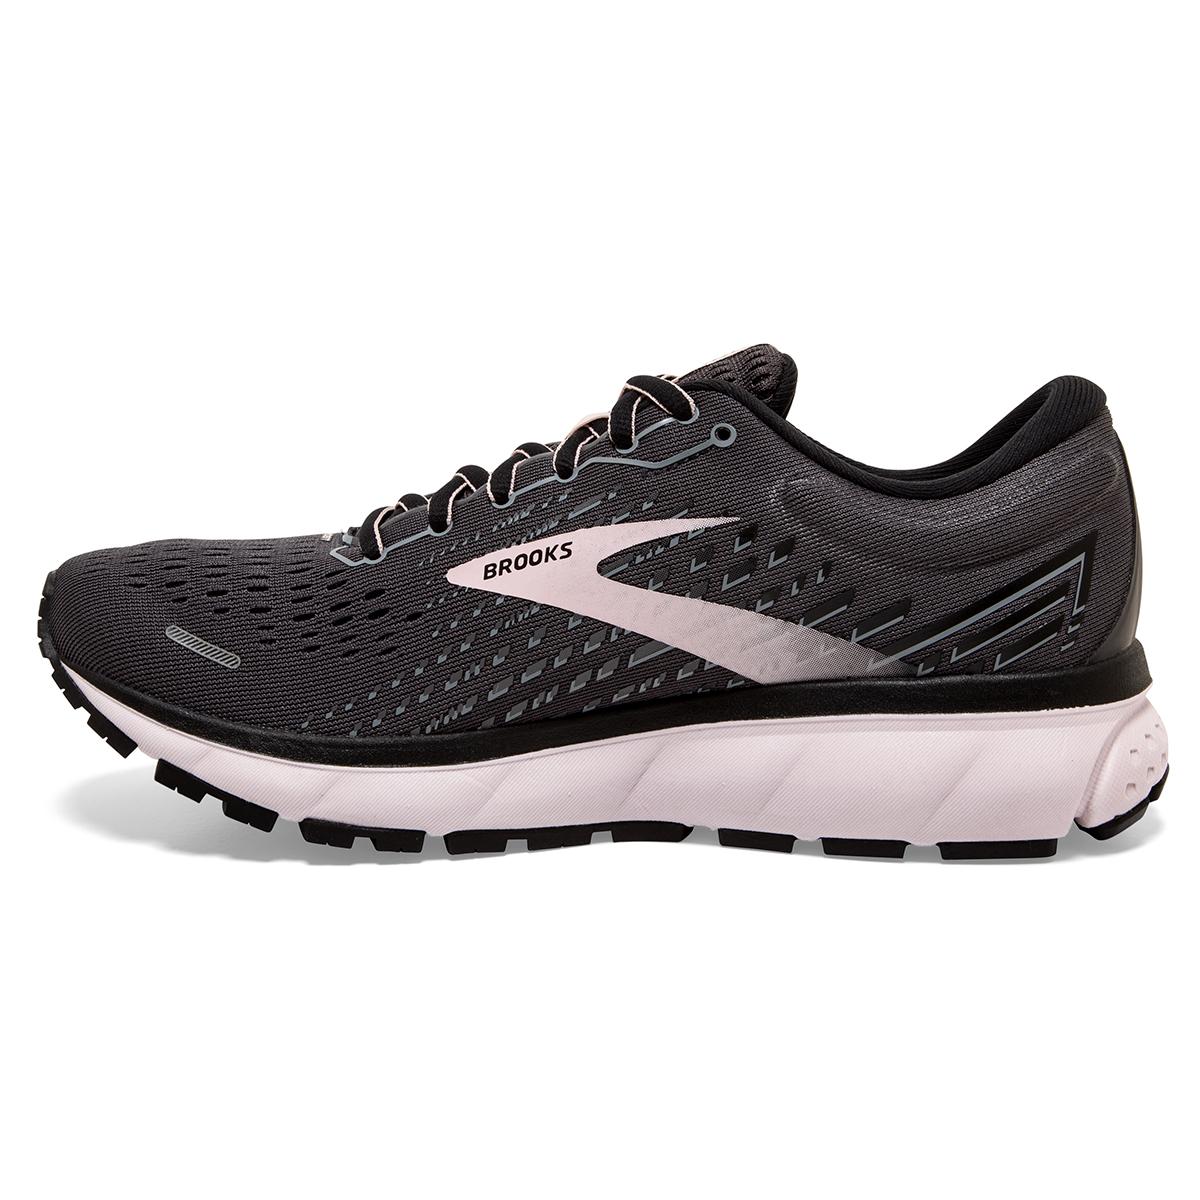 Women's Brooks Ghost 13 Running Shoe, , large, image 5